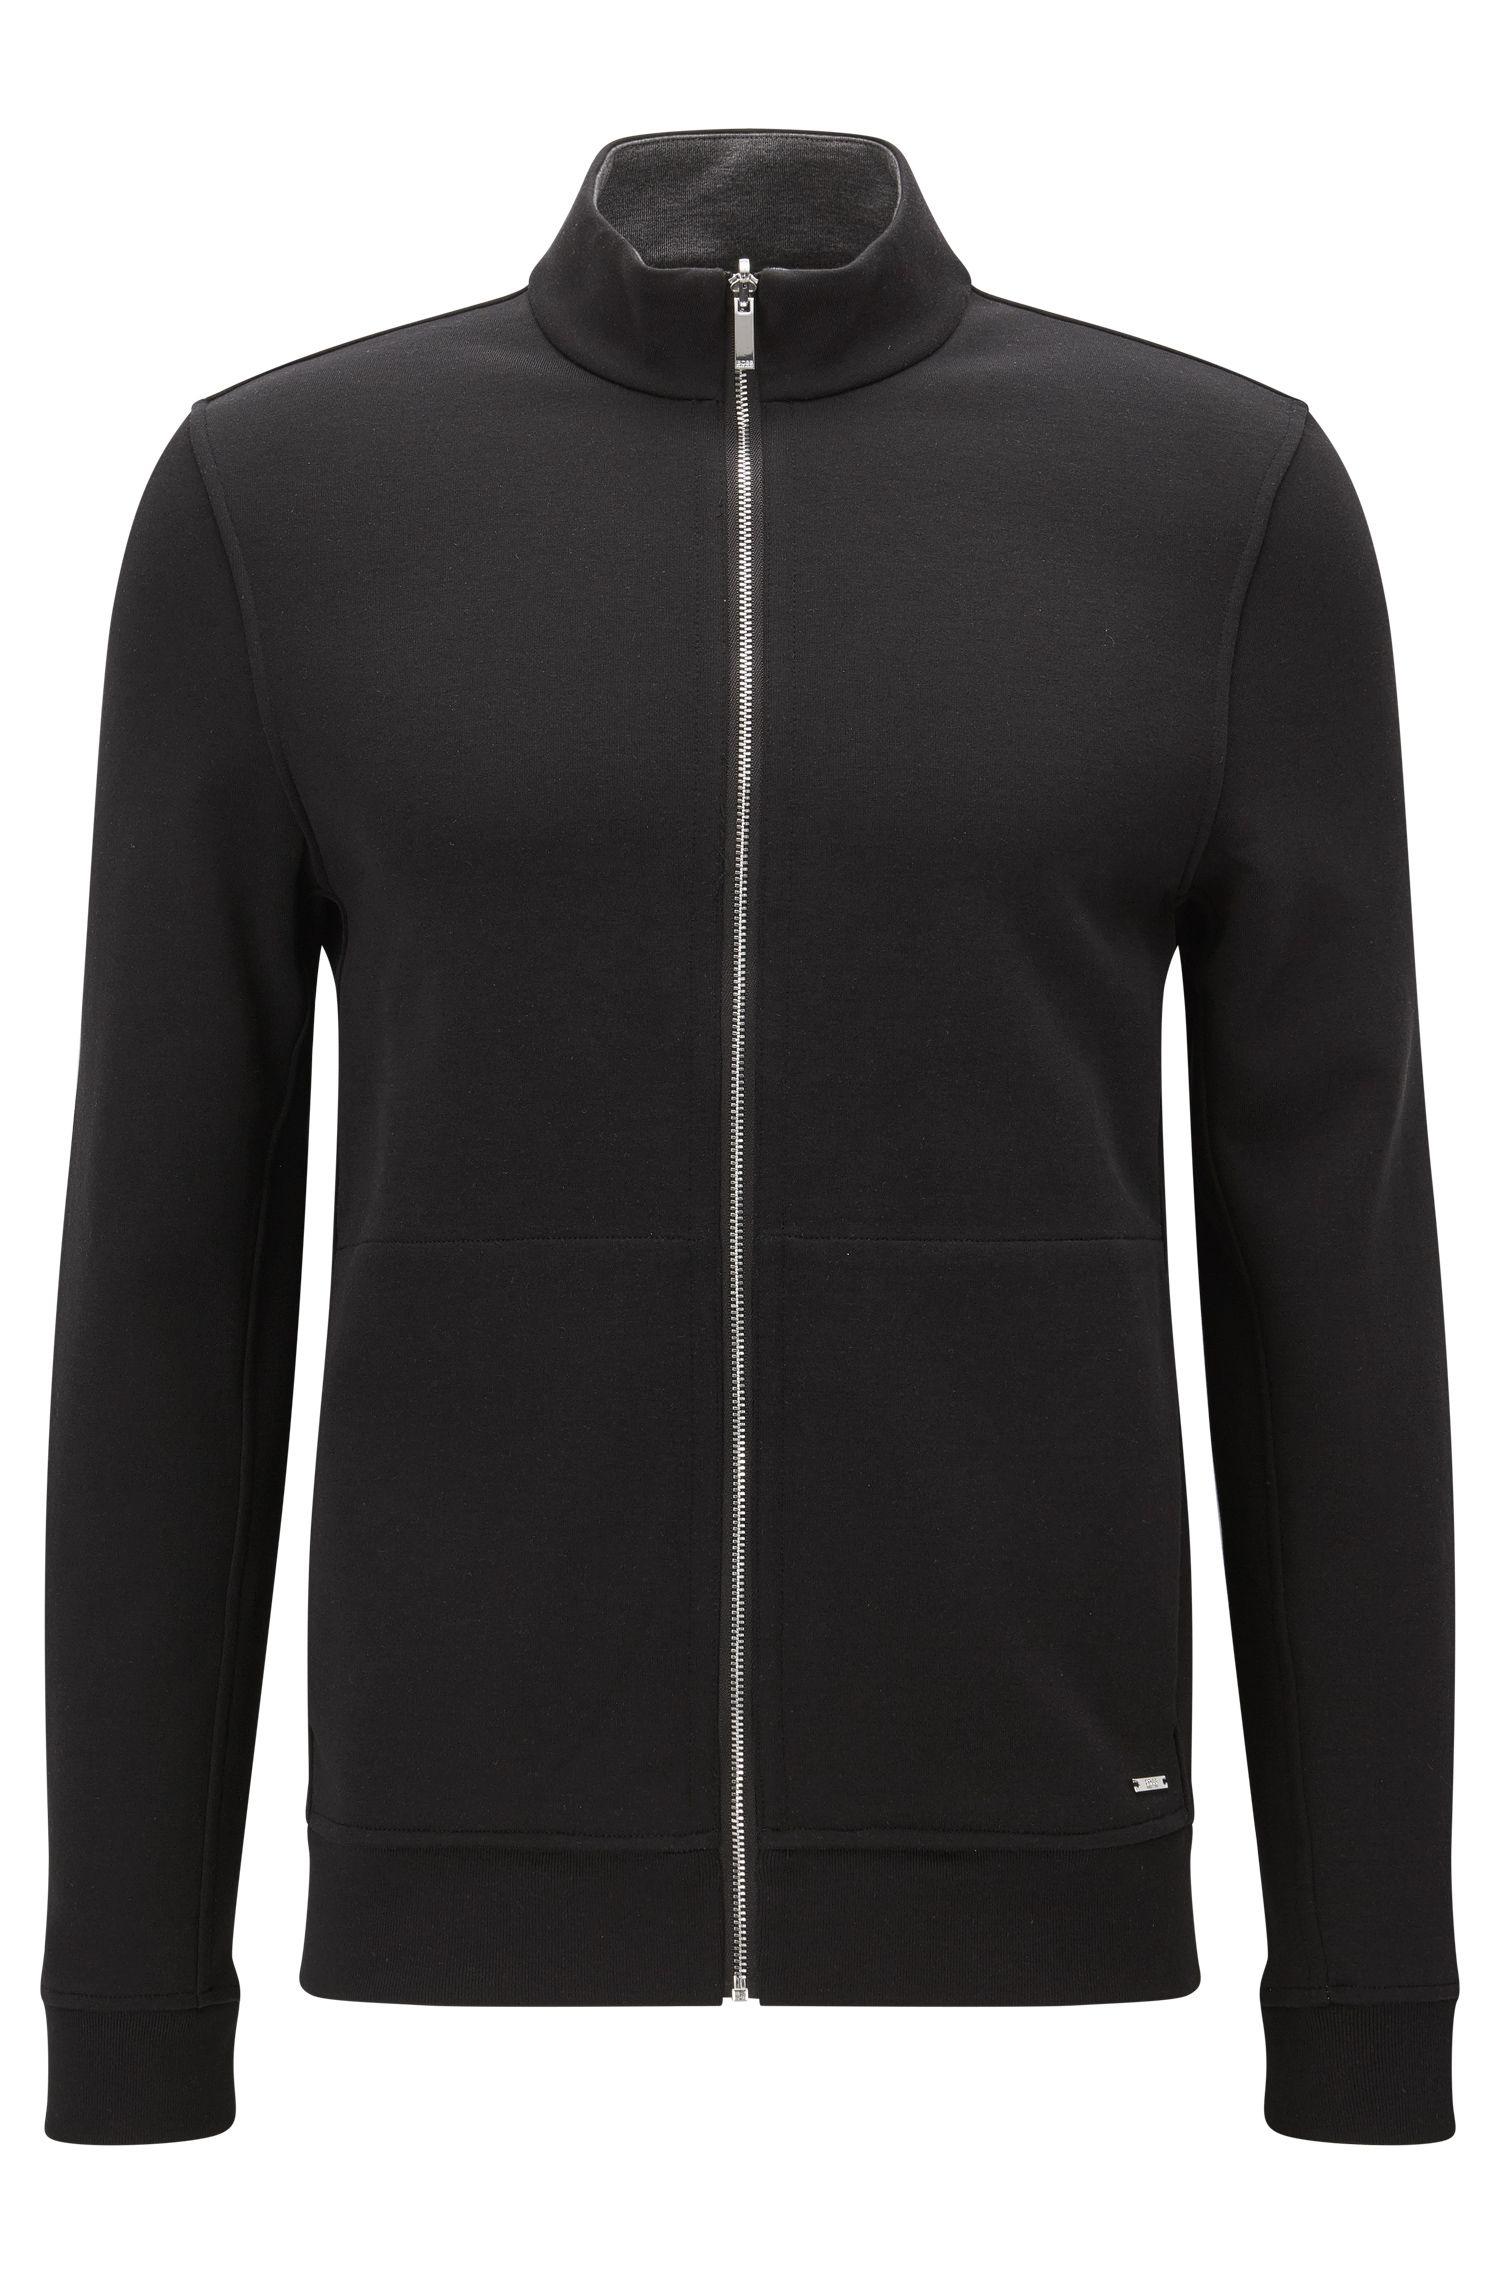 'Scavo'   Cotton Blend Full-Zip Sweater